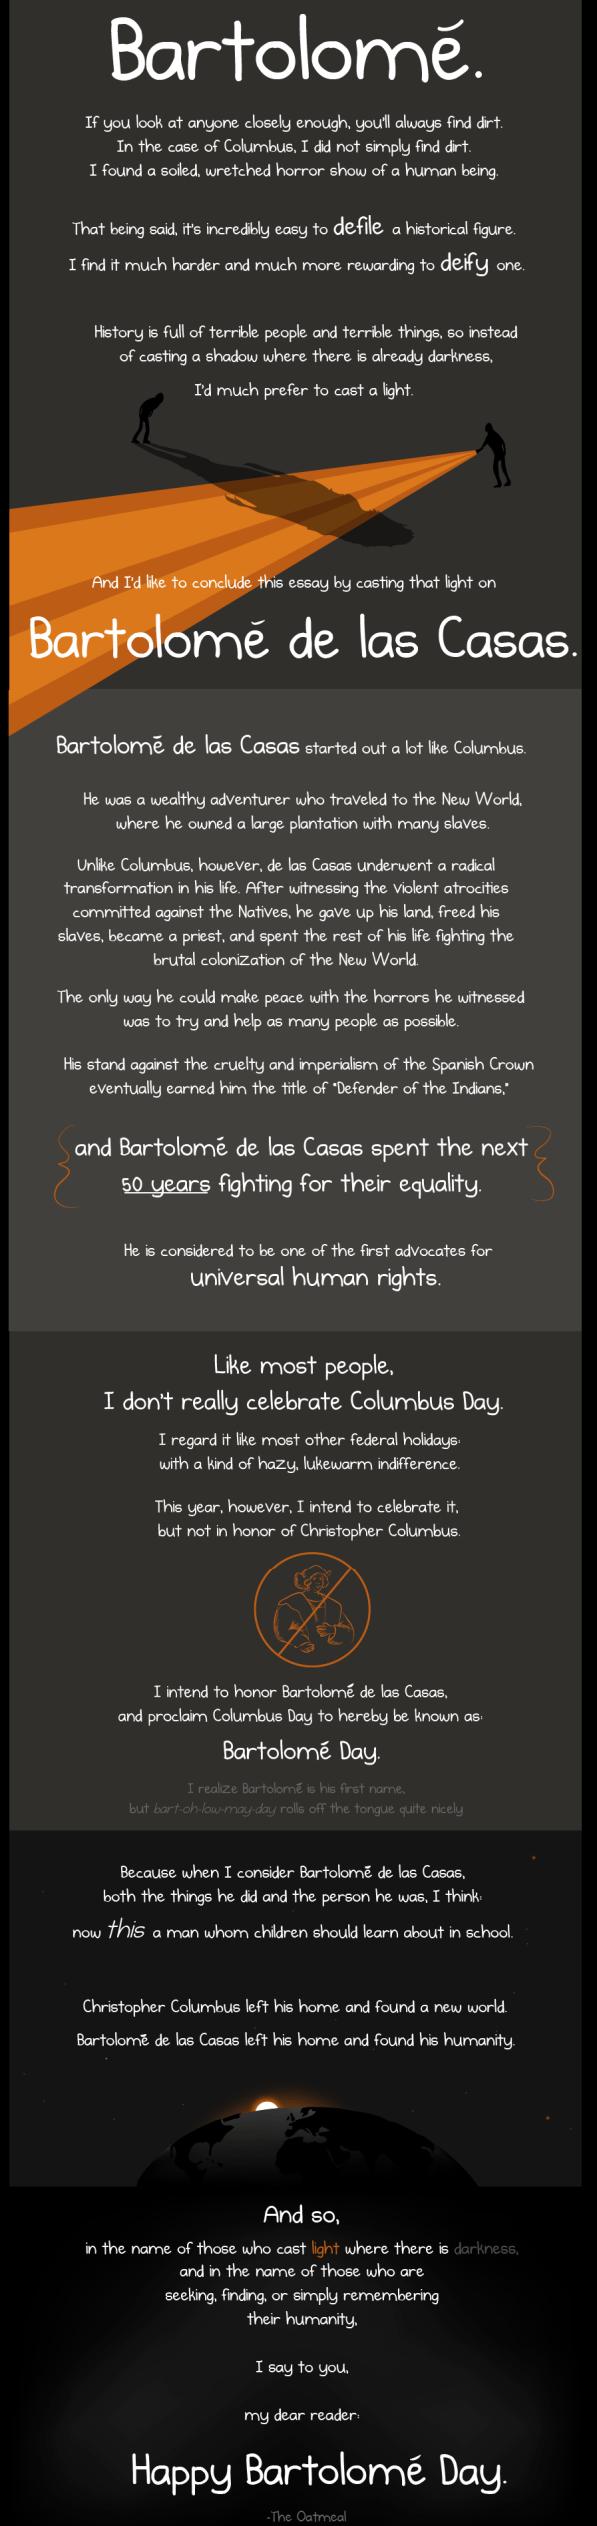 Bartolome de las Casas Day  Infographic